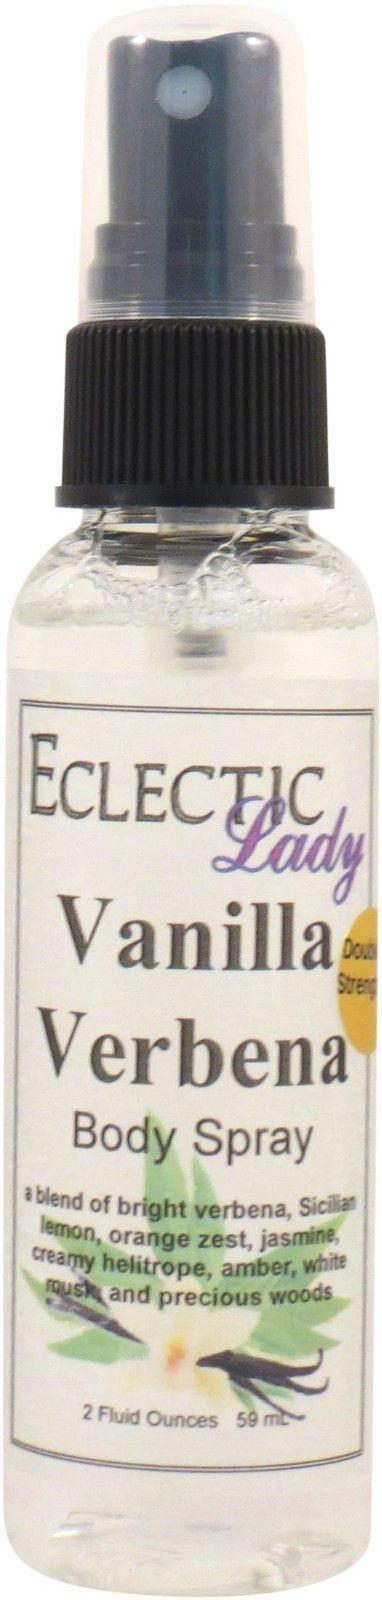 Vanilla Verbena Body Spray